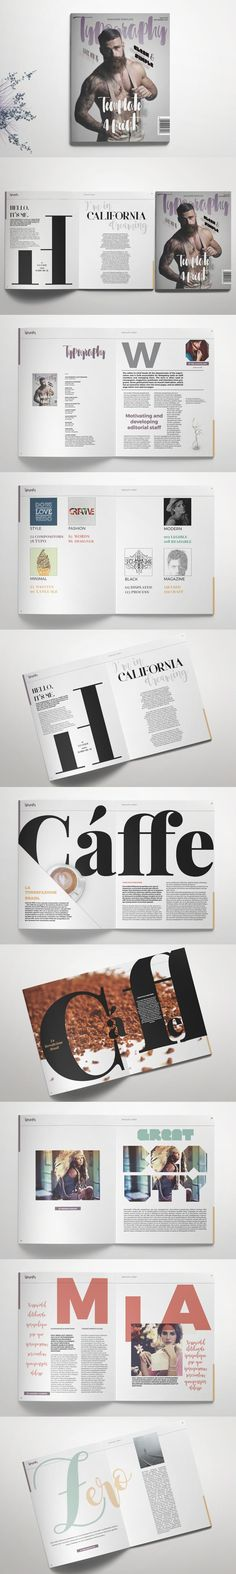 #magazine #design from Template 4 Print | DOWNLOAD: https://creativemarket.com/template4print/671113-Typography-Magazine?u=zsoltczigler